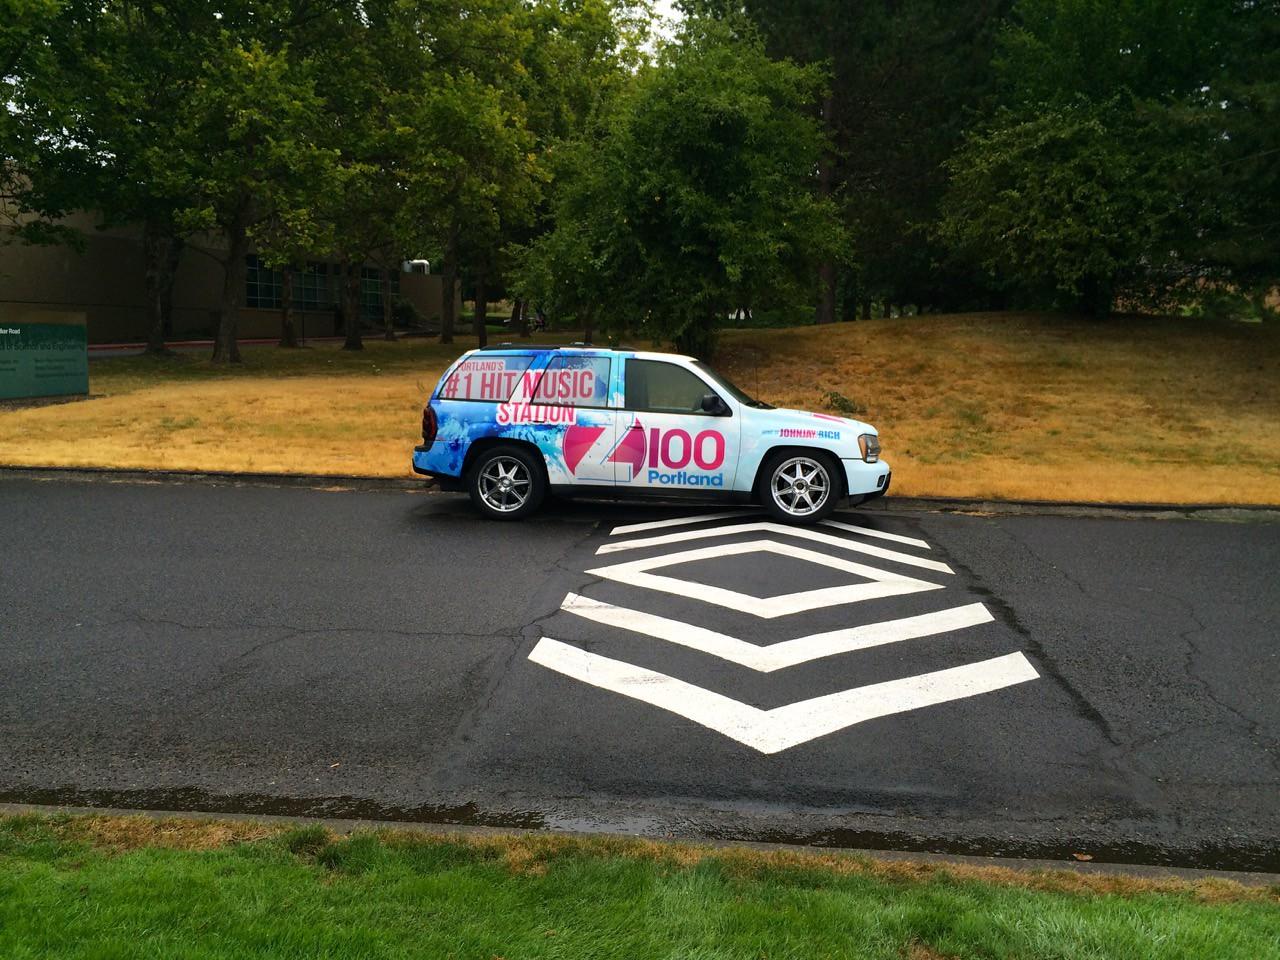 2015 Tour de Cure Oregon, Amberglen Park, Hillsboro.<br /> The 29 Ride (Green course) 9:30am start